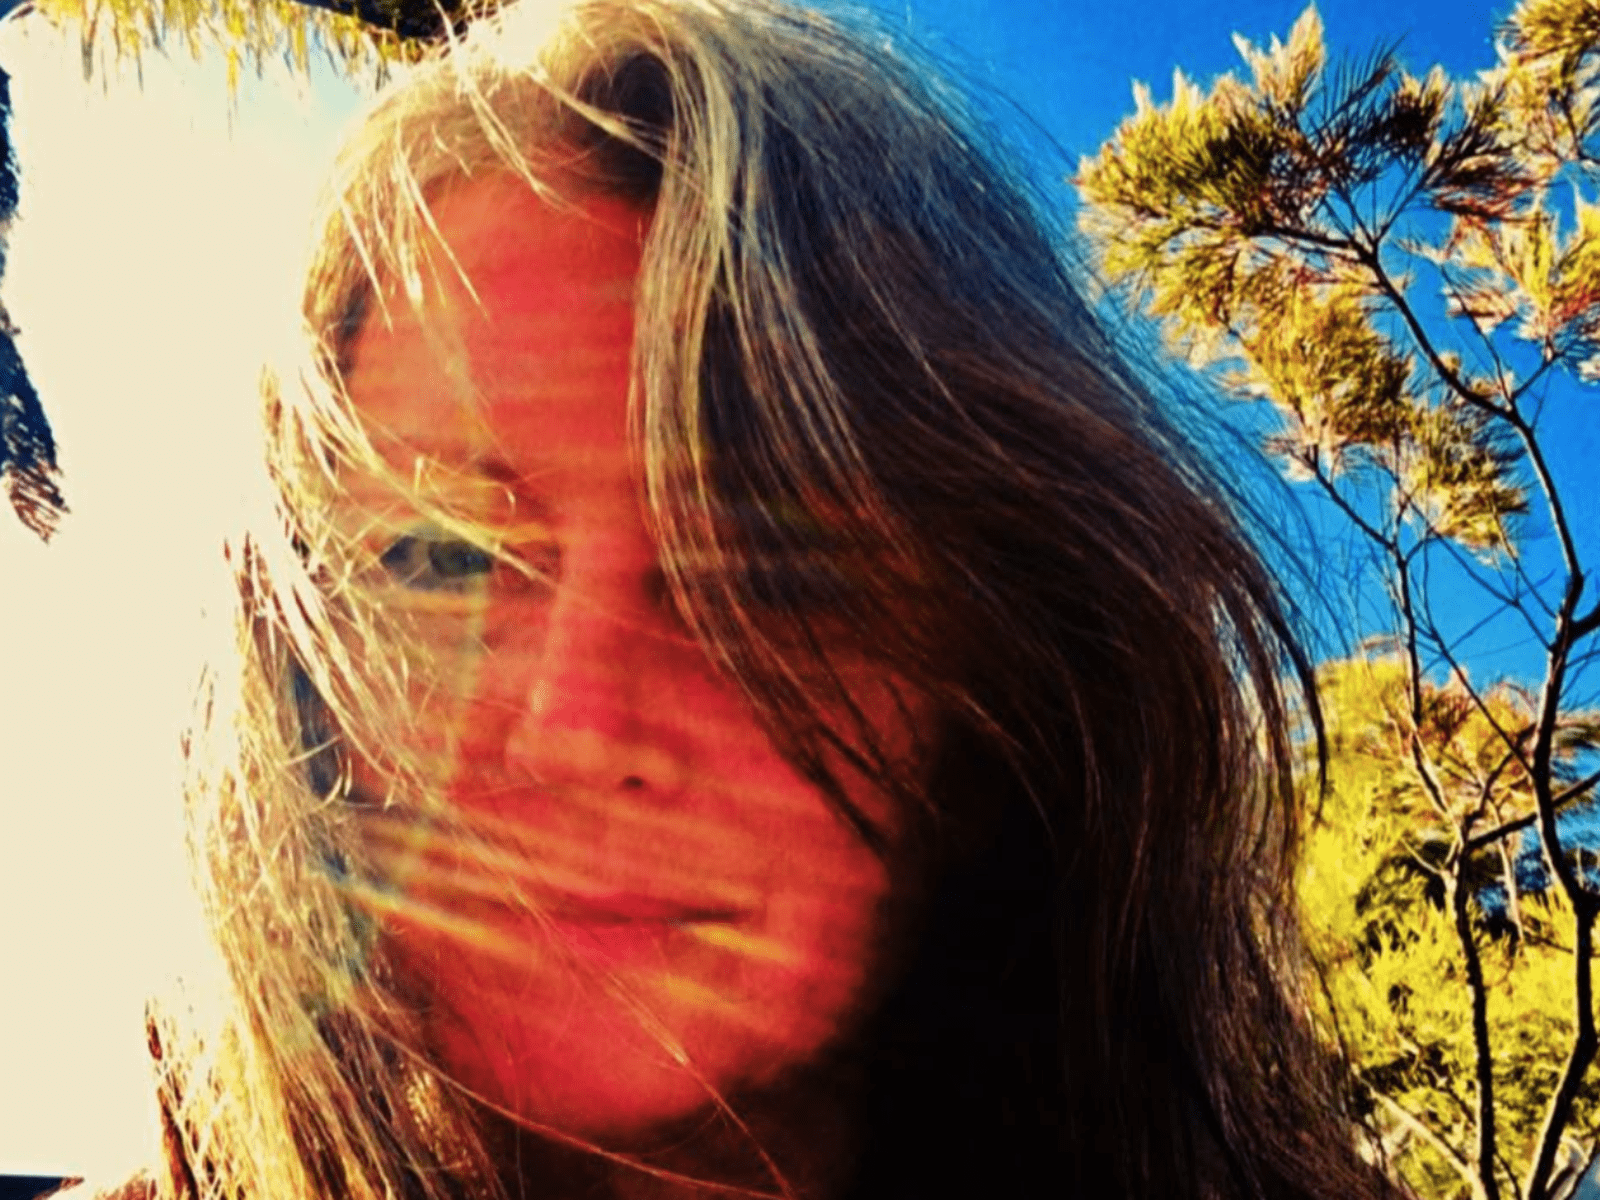 Helen from Perth, Western Australia, Australia